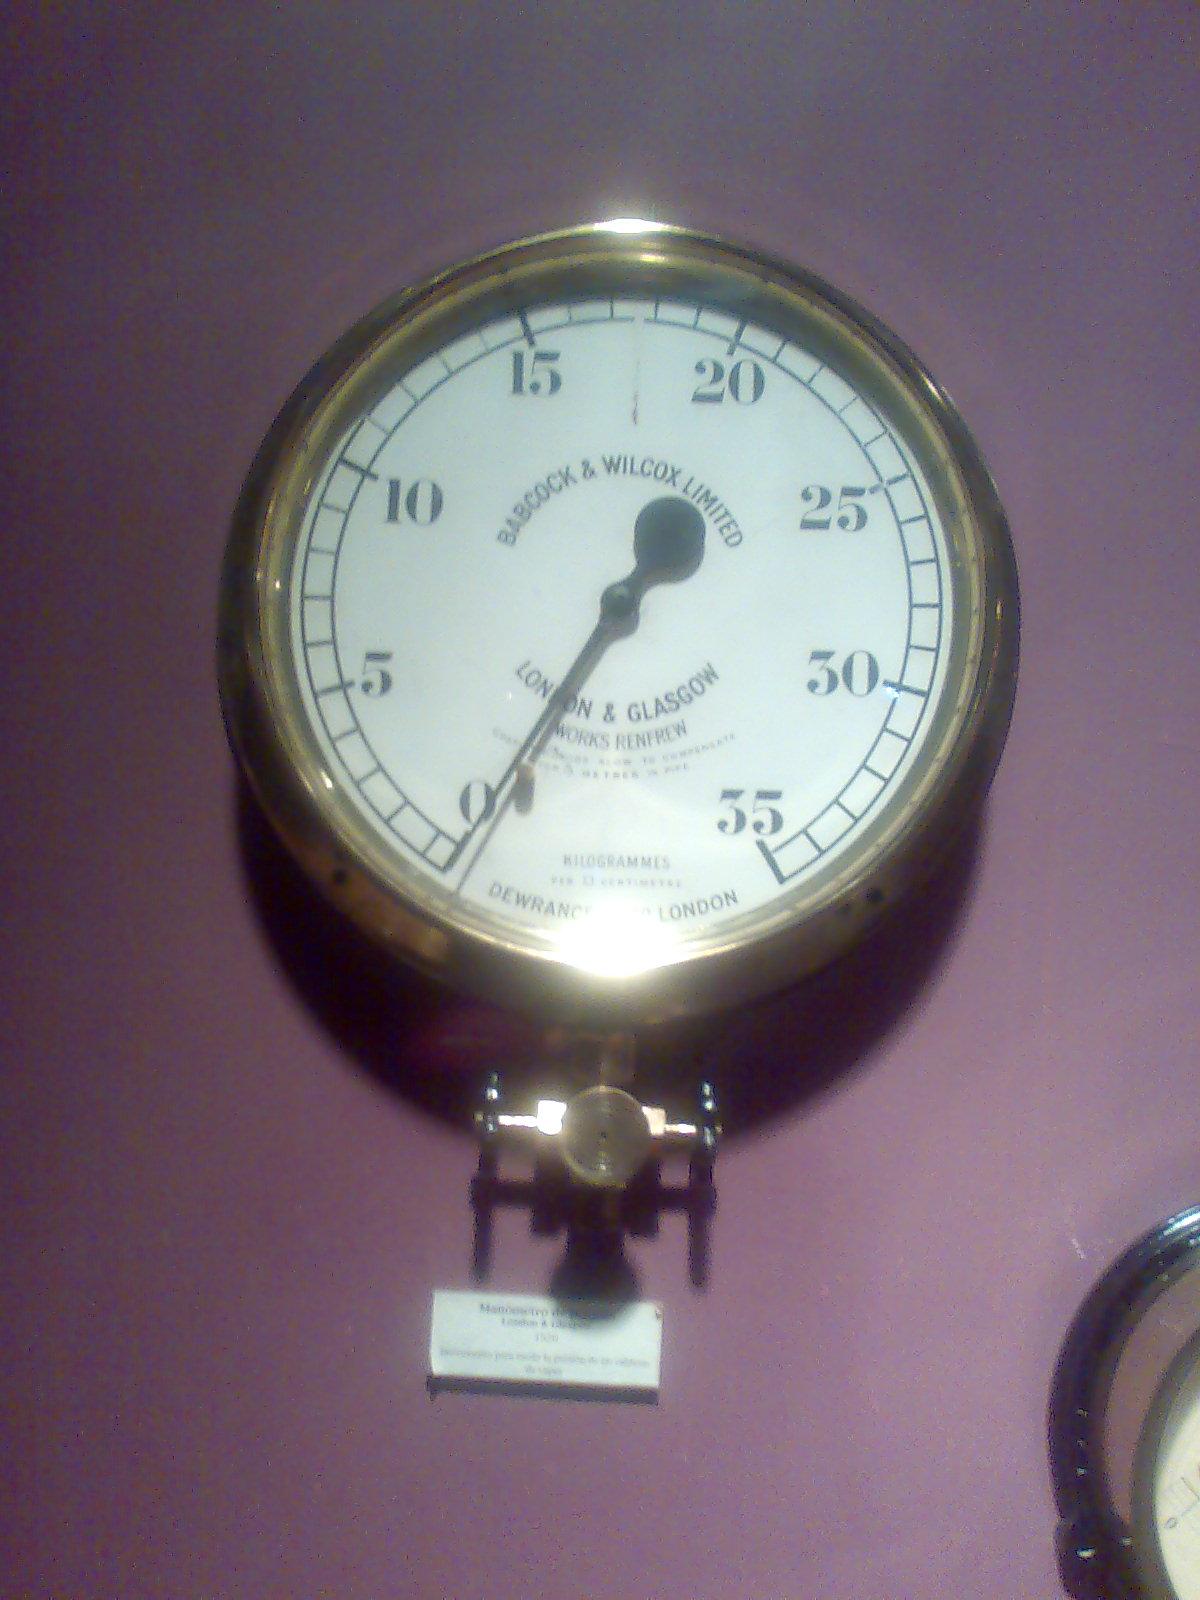 File:Manómetro de presión.jpg - Wikimedia Commons